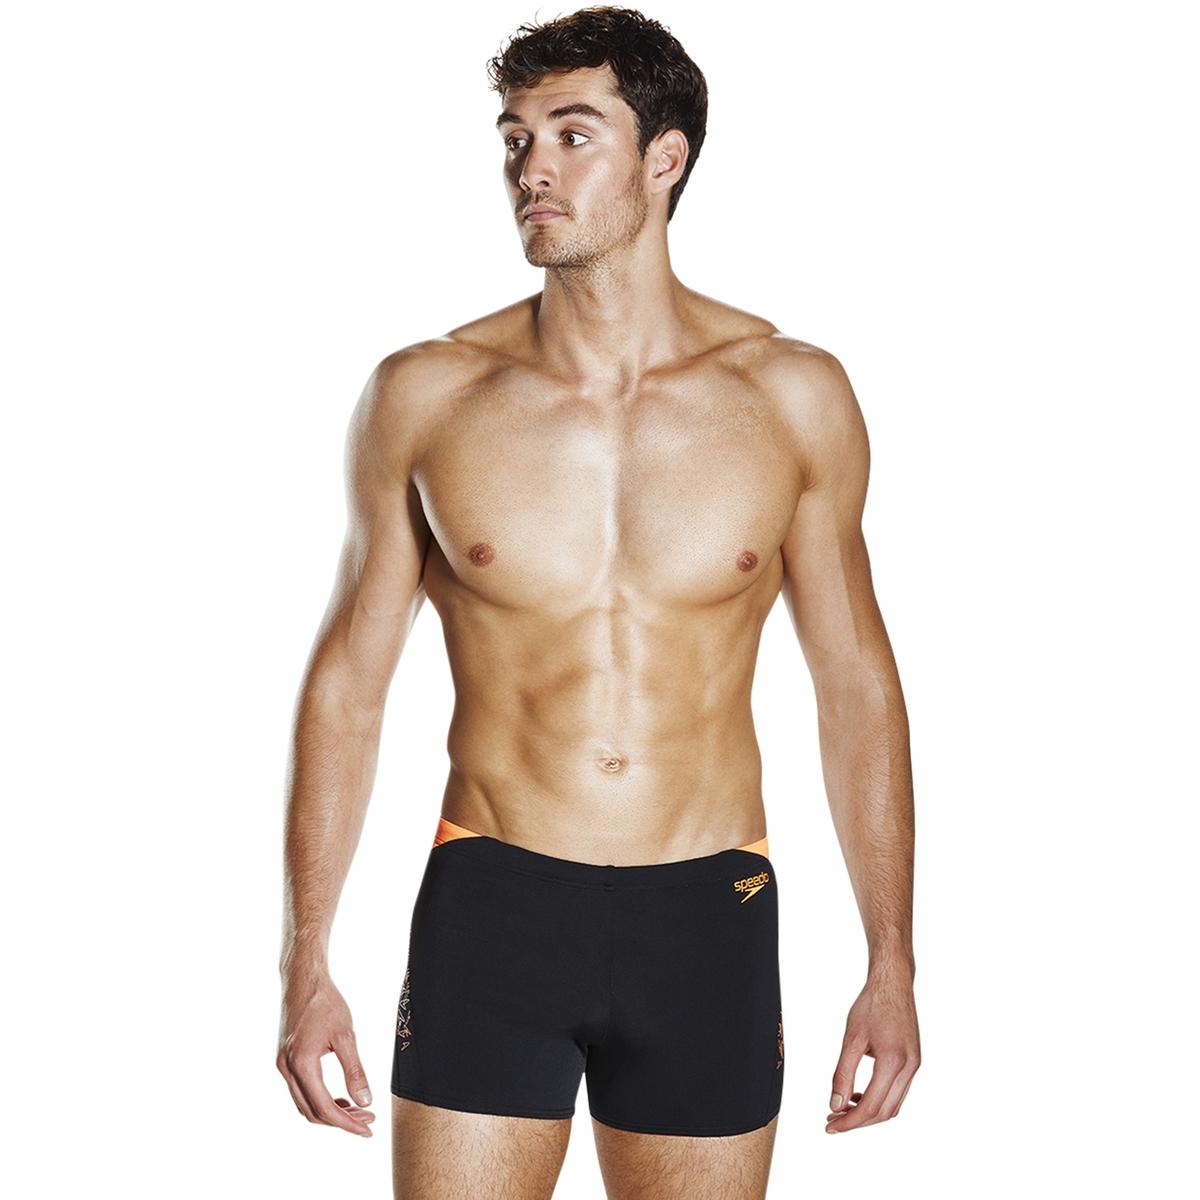 Badeshorts| Endurance®+ Technologie| bedruckt | Bekleidung > Bademode > Badeshorts | Schwarz | Polyester | SPEEDO